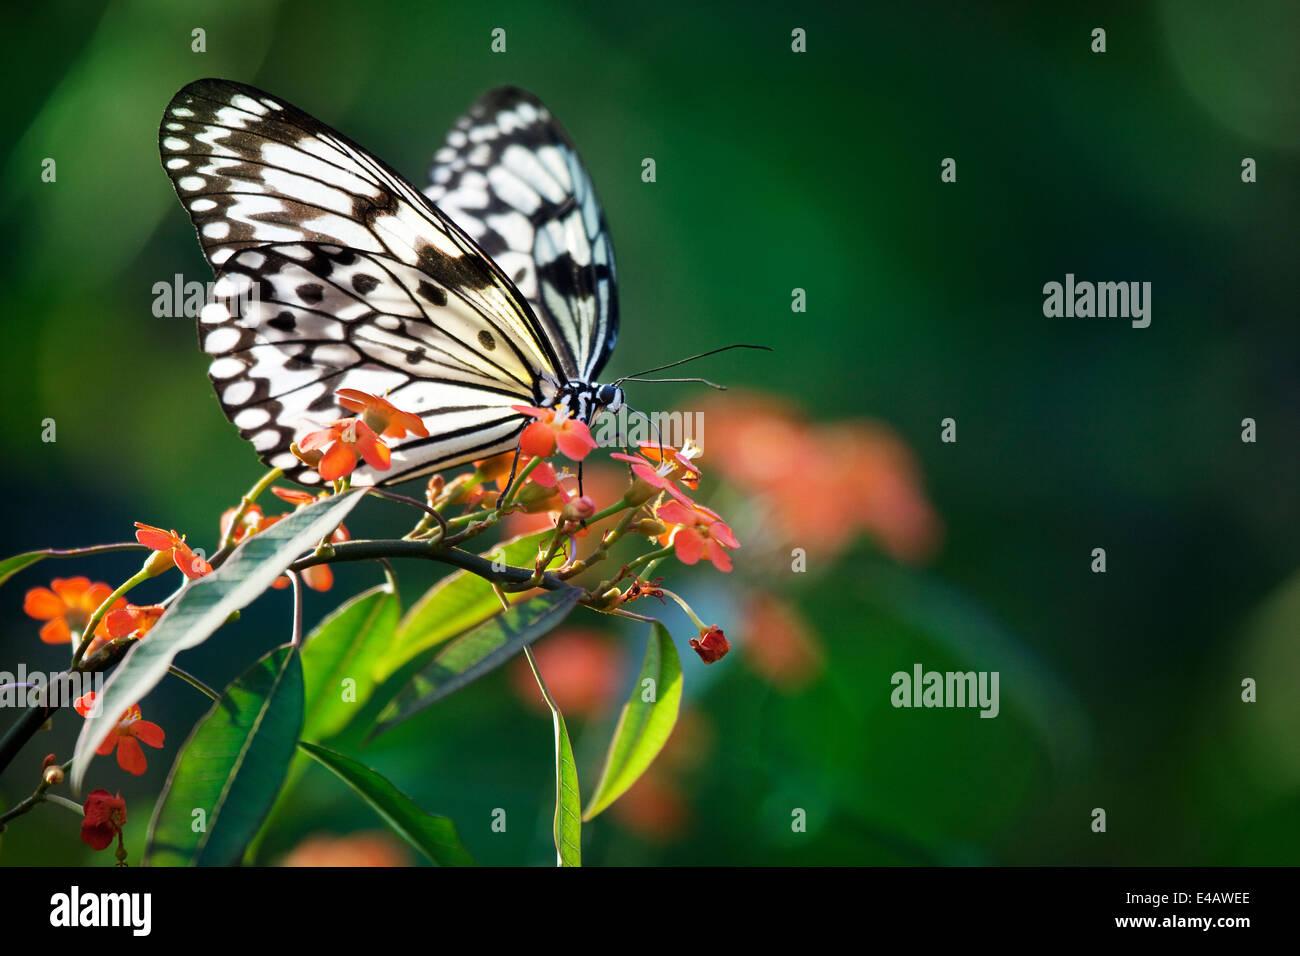 Hermosa mariposa sobre flores rojas Imagen De Stock